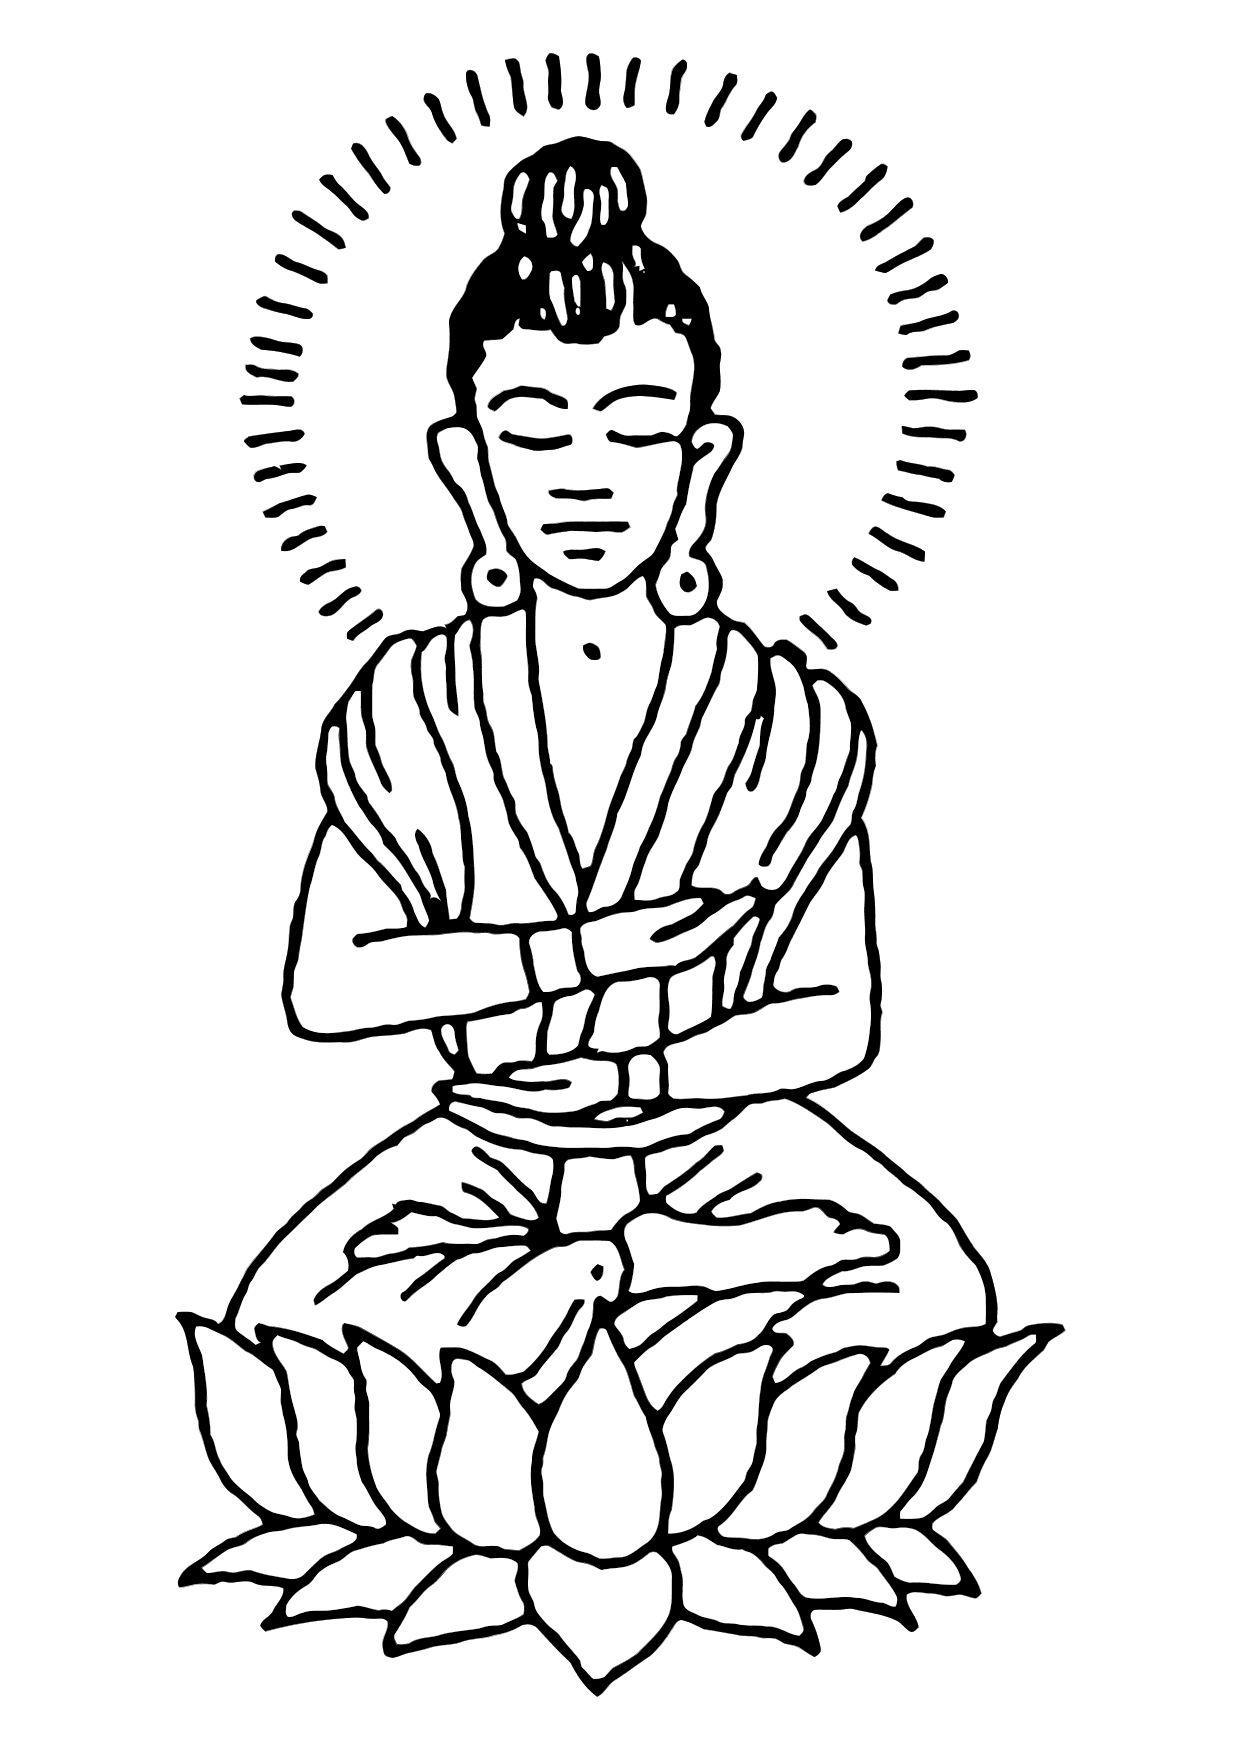 Volwassenen Kleurplaat Boeddha Bilde 229 Fargelegge Buddha Bil 11444